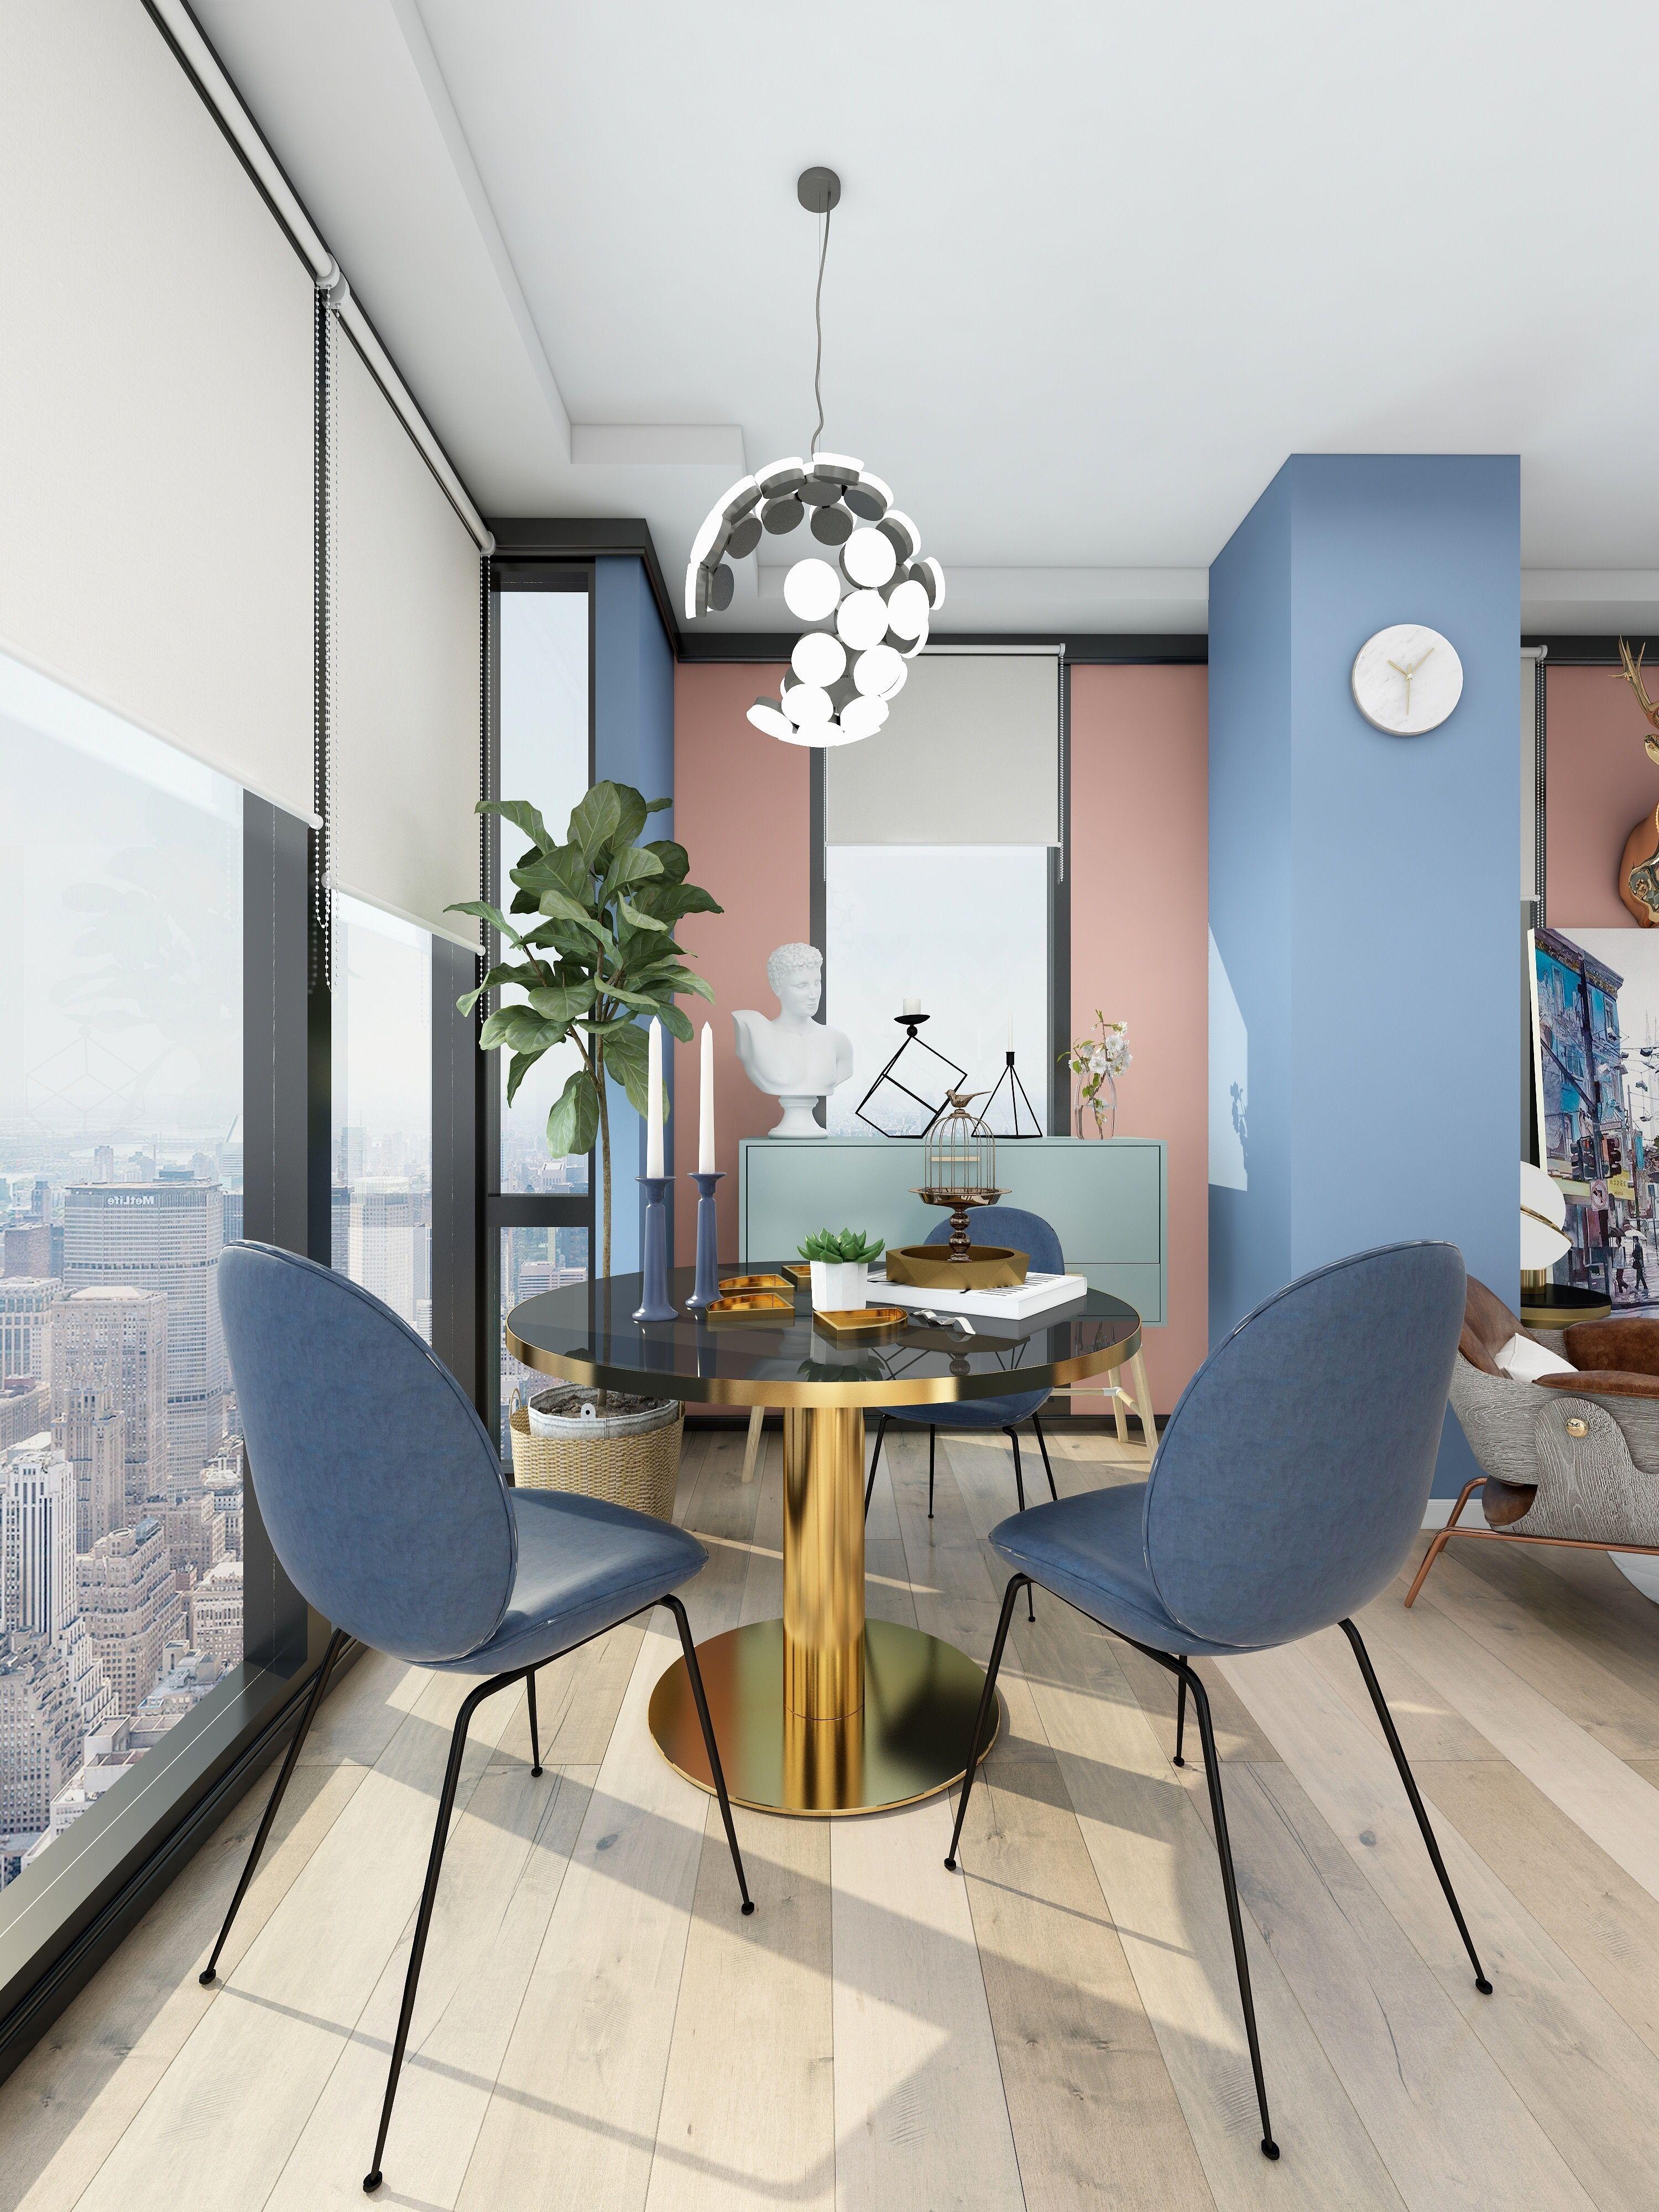 3d Room Interior Design: Realistic Room Design Created With Platform Coohom